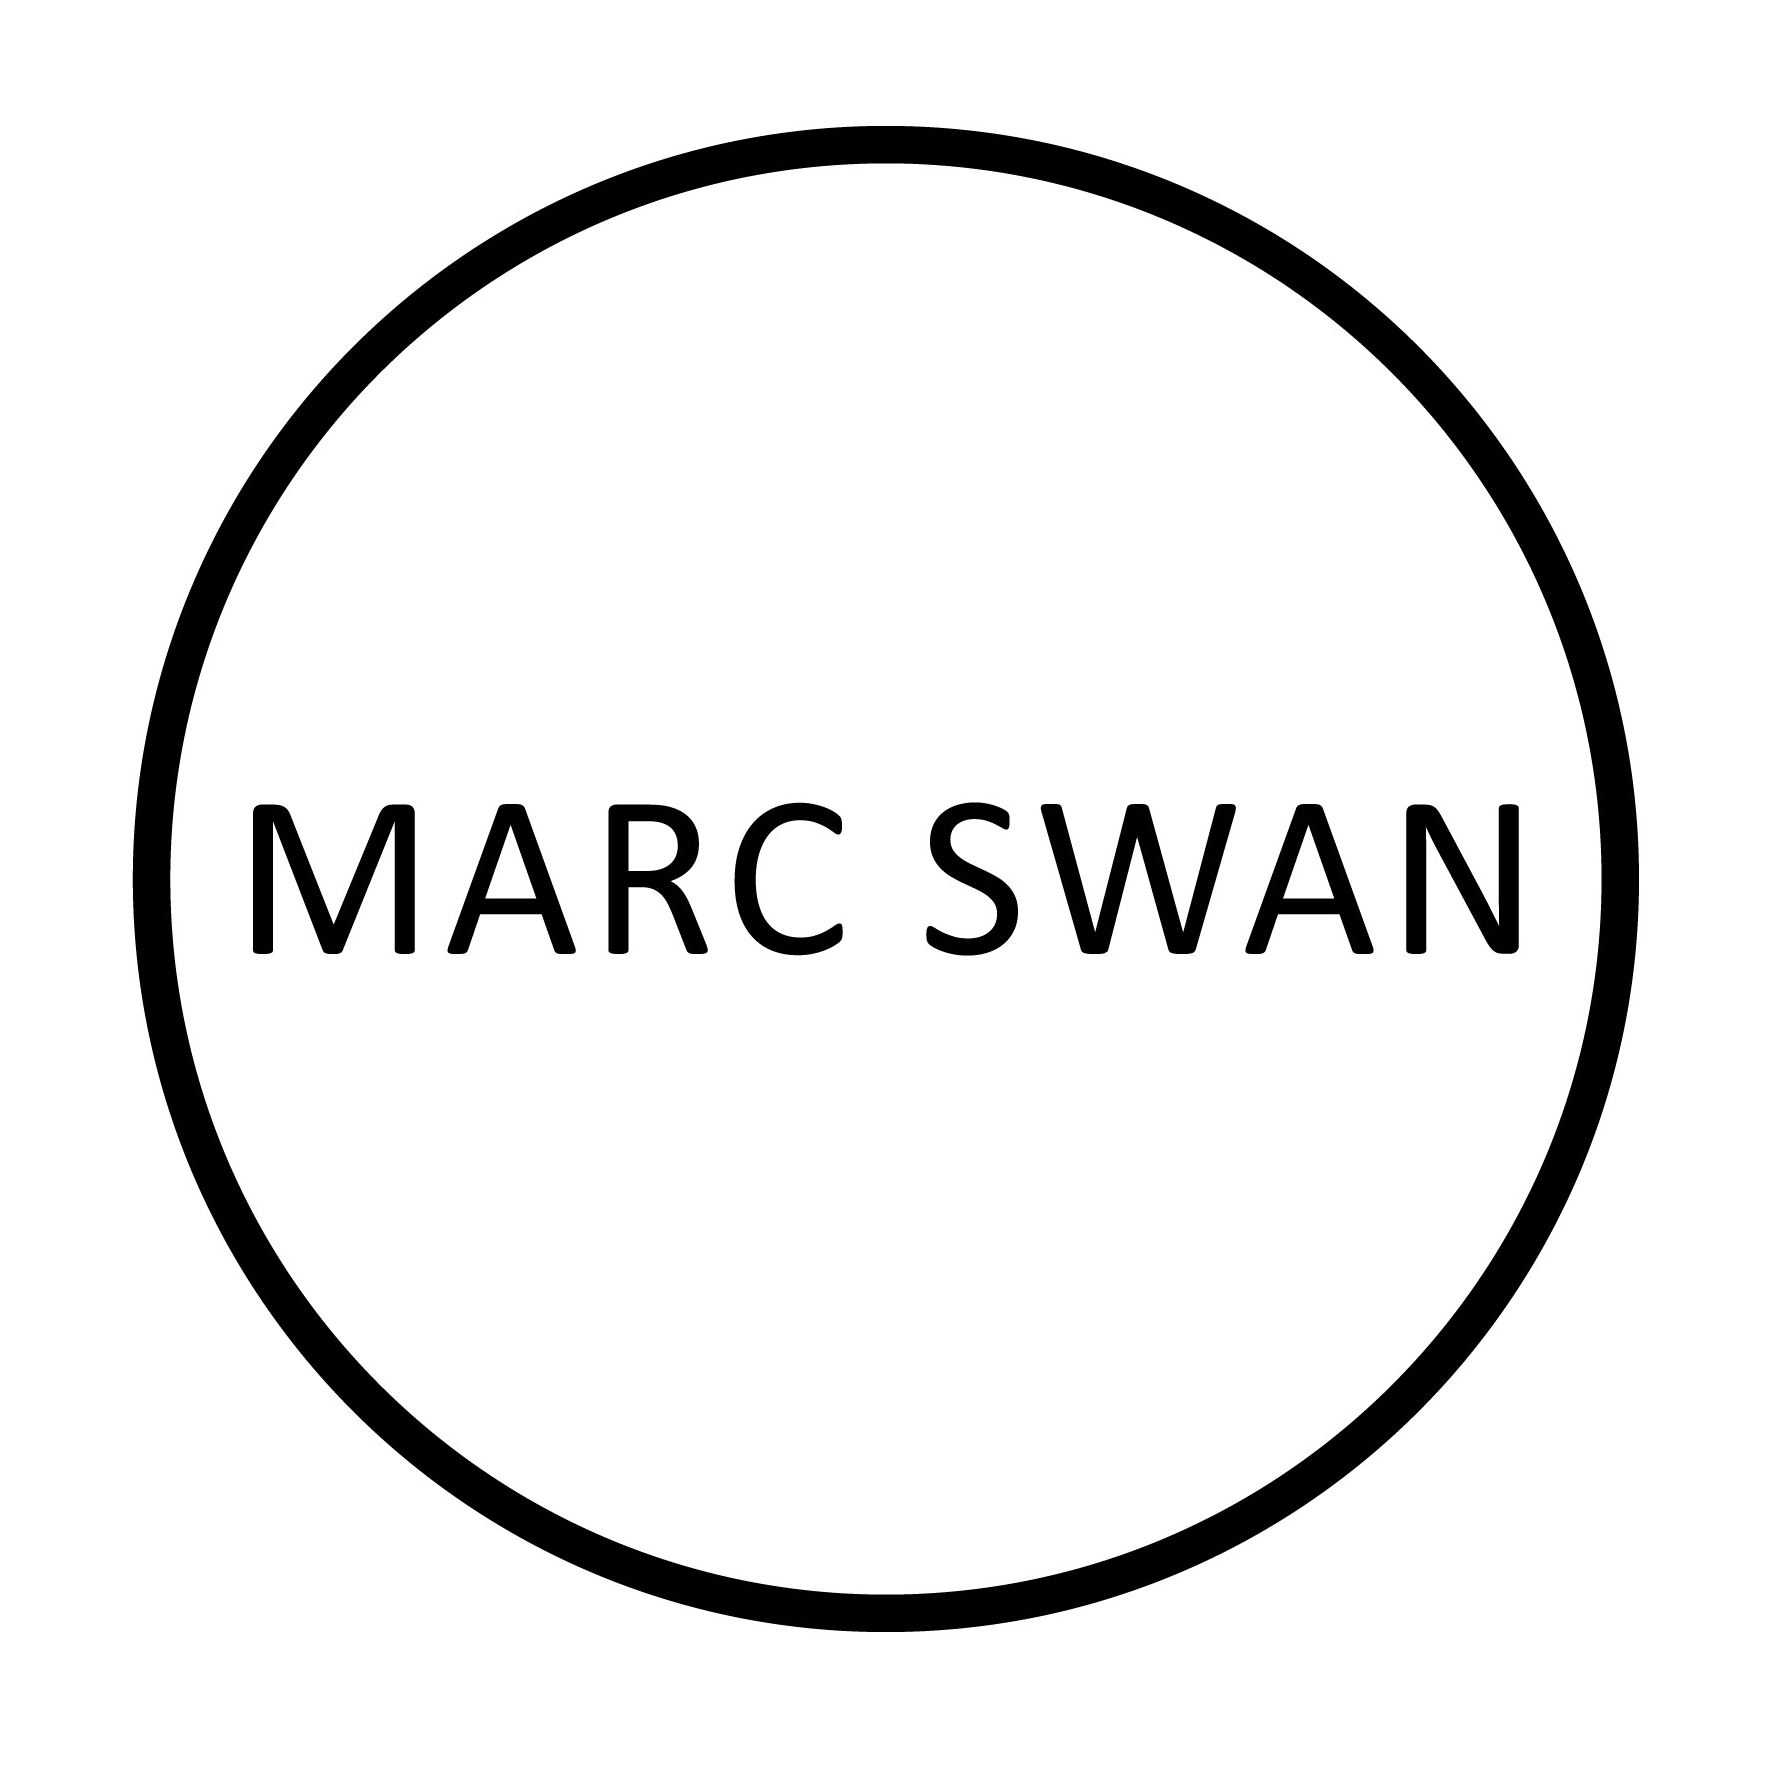 MARC SWAN